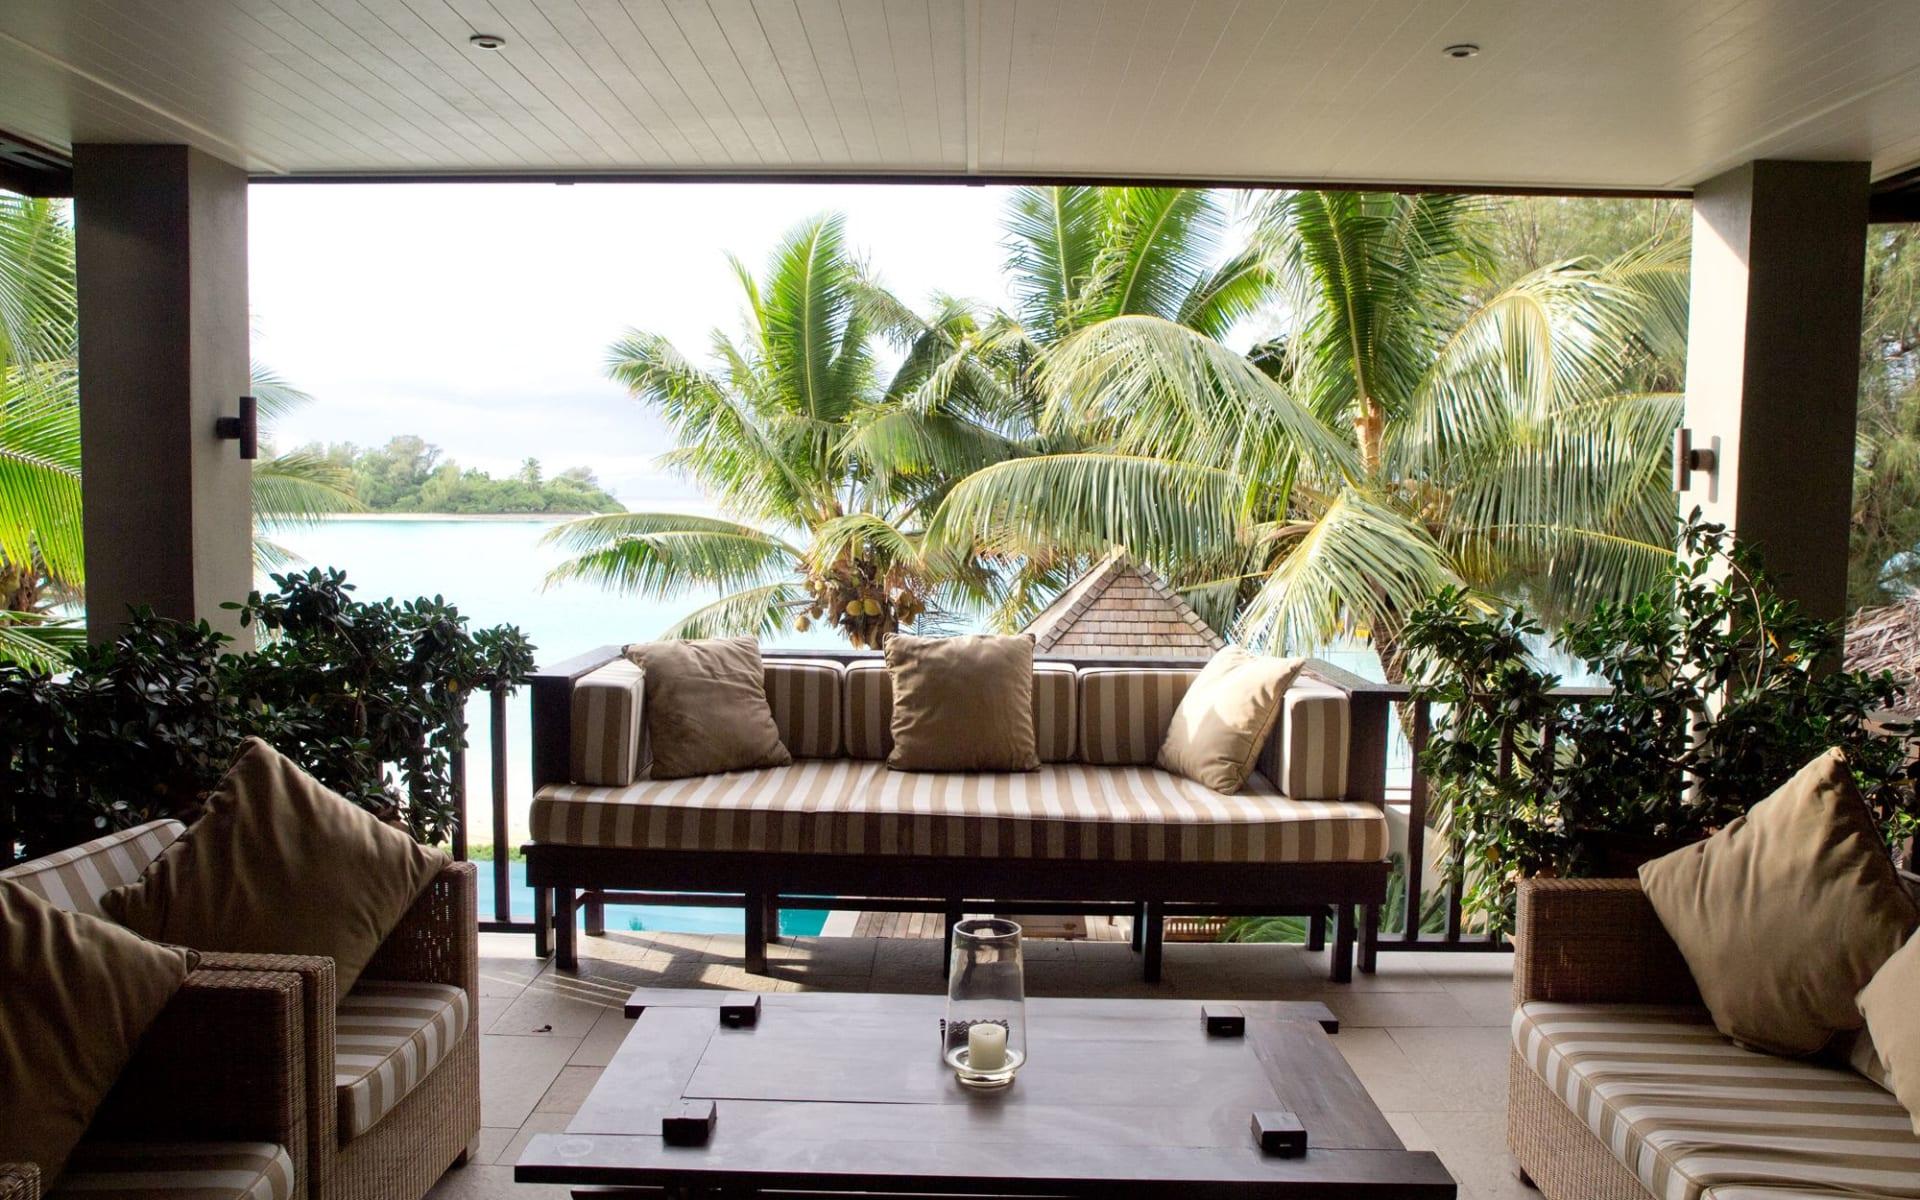 Te Vakaroa Villas in Rarotonga:  Te-Vakaroa-Villas-2-Bedroom-Villa-